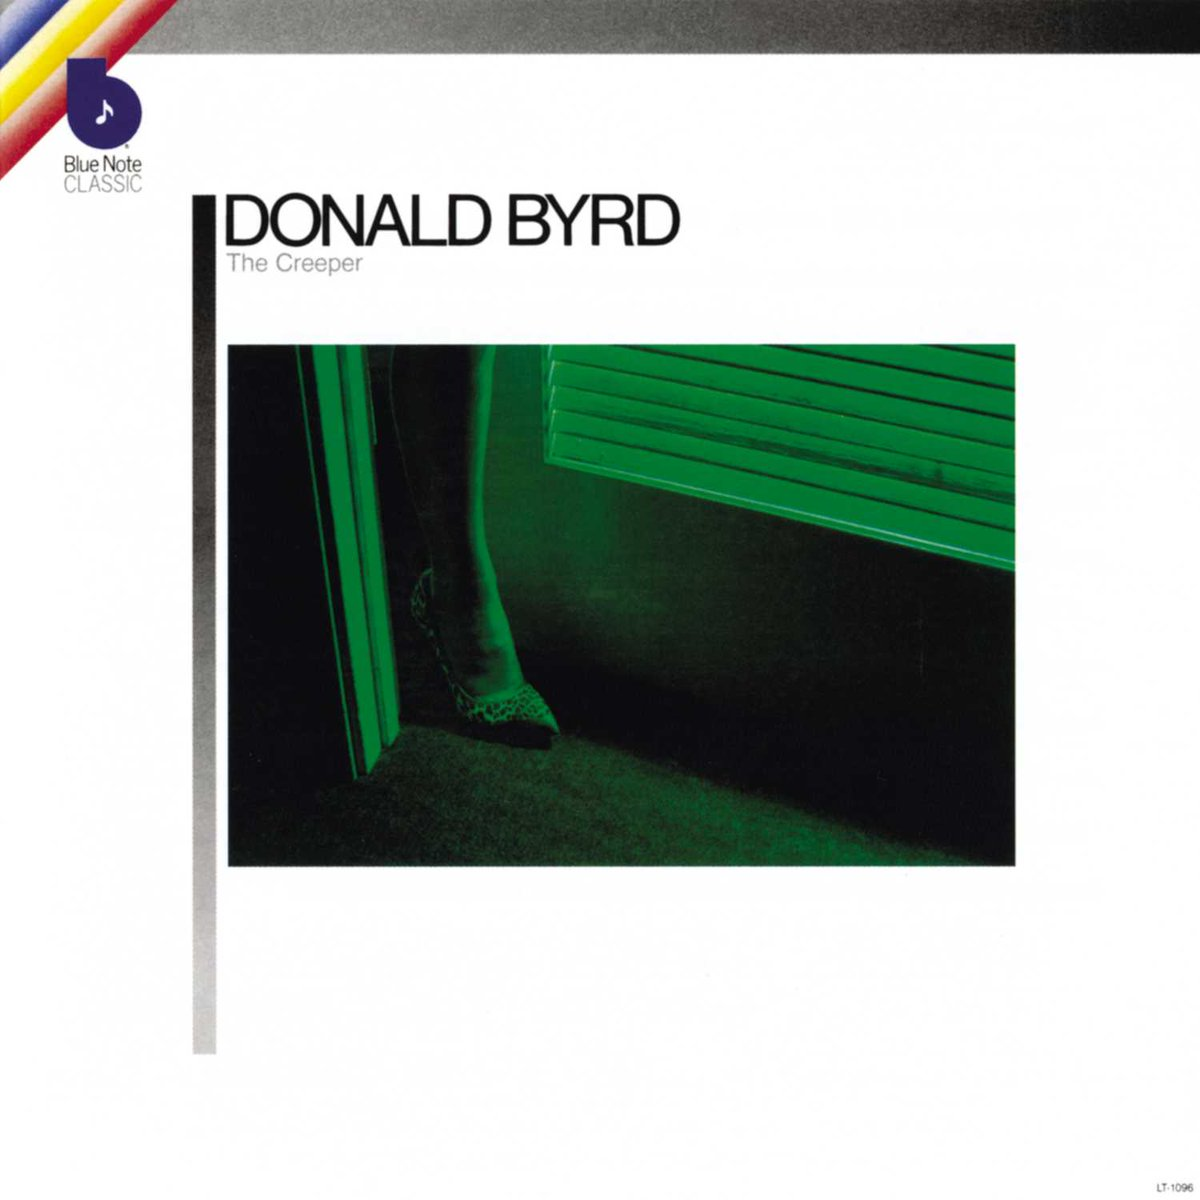 #DonaldByrd #TheCreeper Donald Byrd/trumpet Sonny Red/a. sax Pepper Adams/b. sax Chick Corea/piano Miroslav Vitous/bass Mickey Roker/drums<br>http://pic.twitter.com/hZZRZ3F3wf